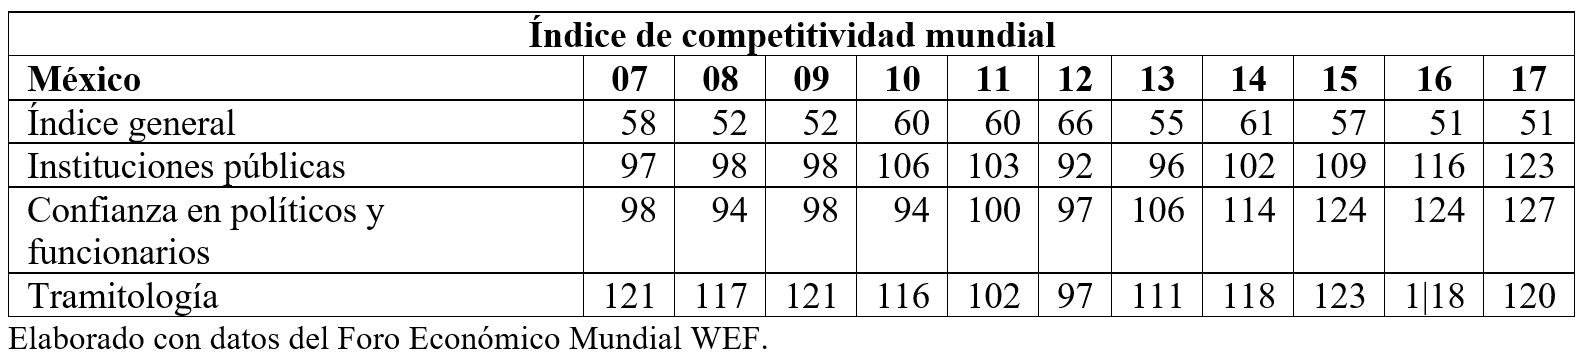 índice competitividad mundial